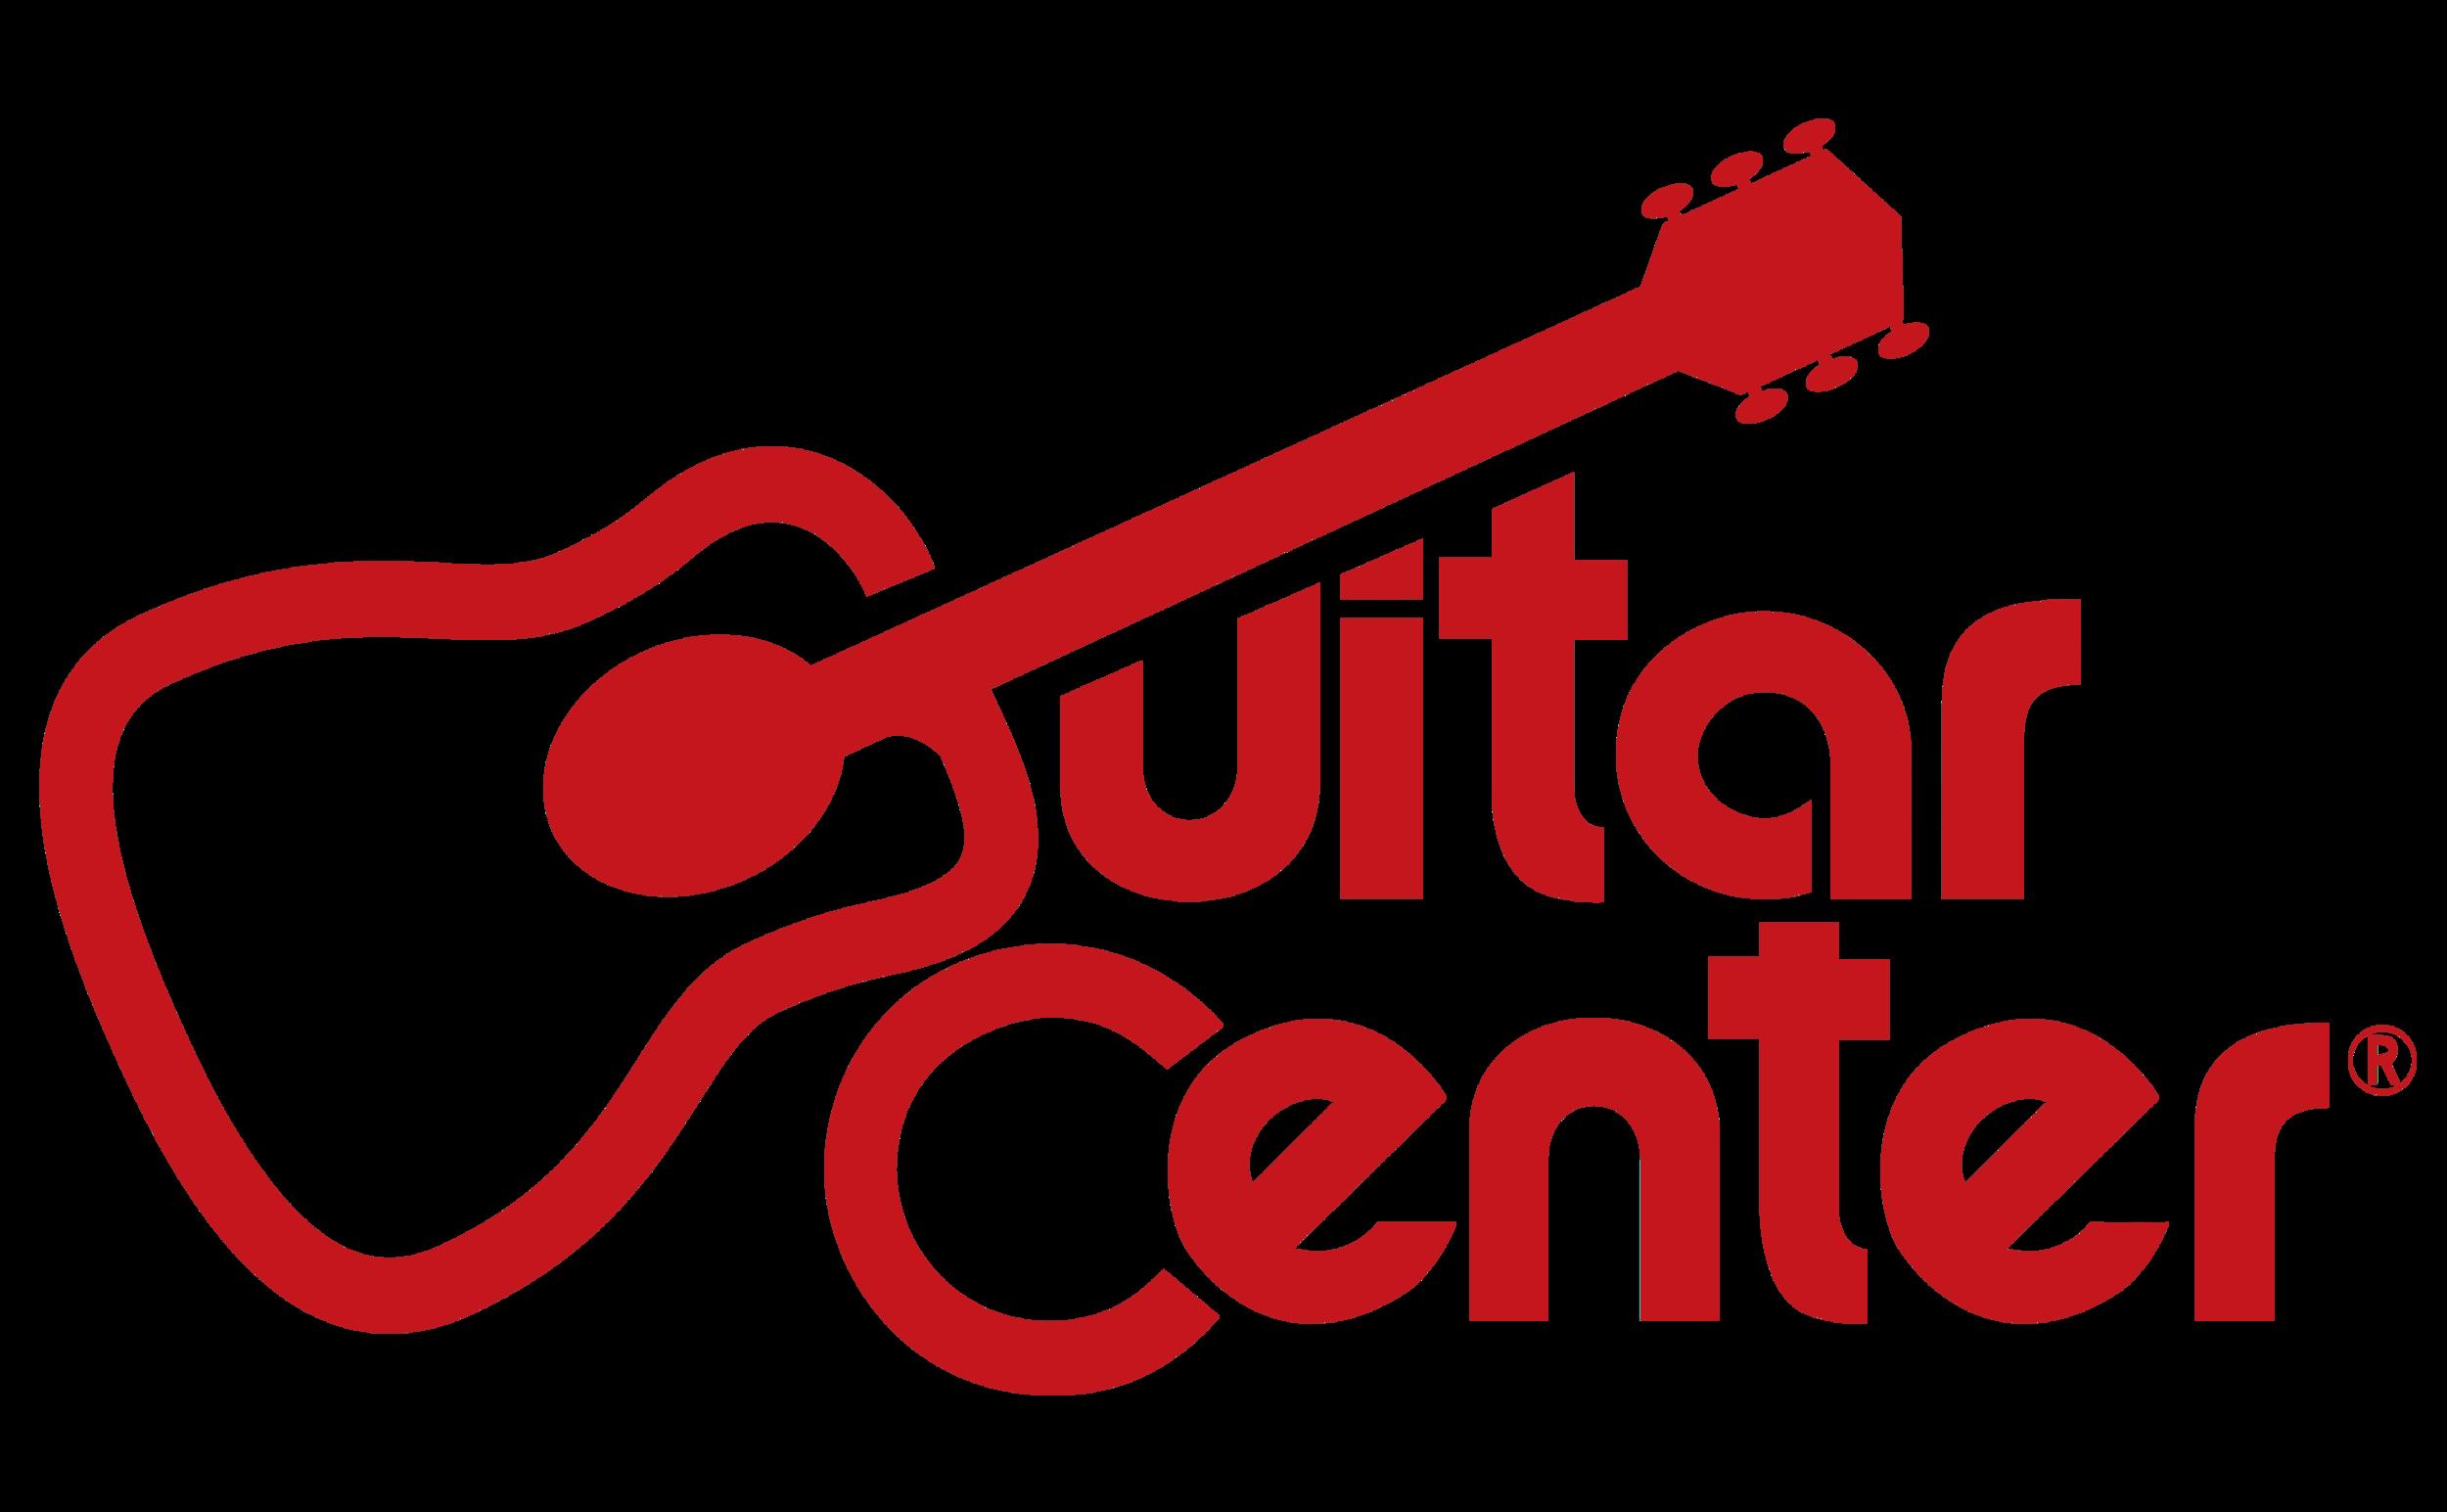 Guitar_Center_logo_logotipo.png